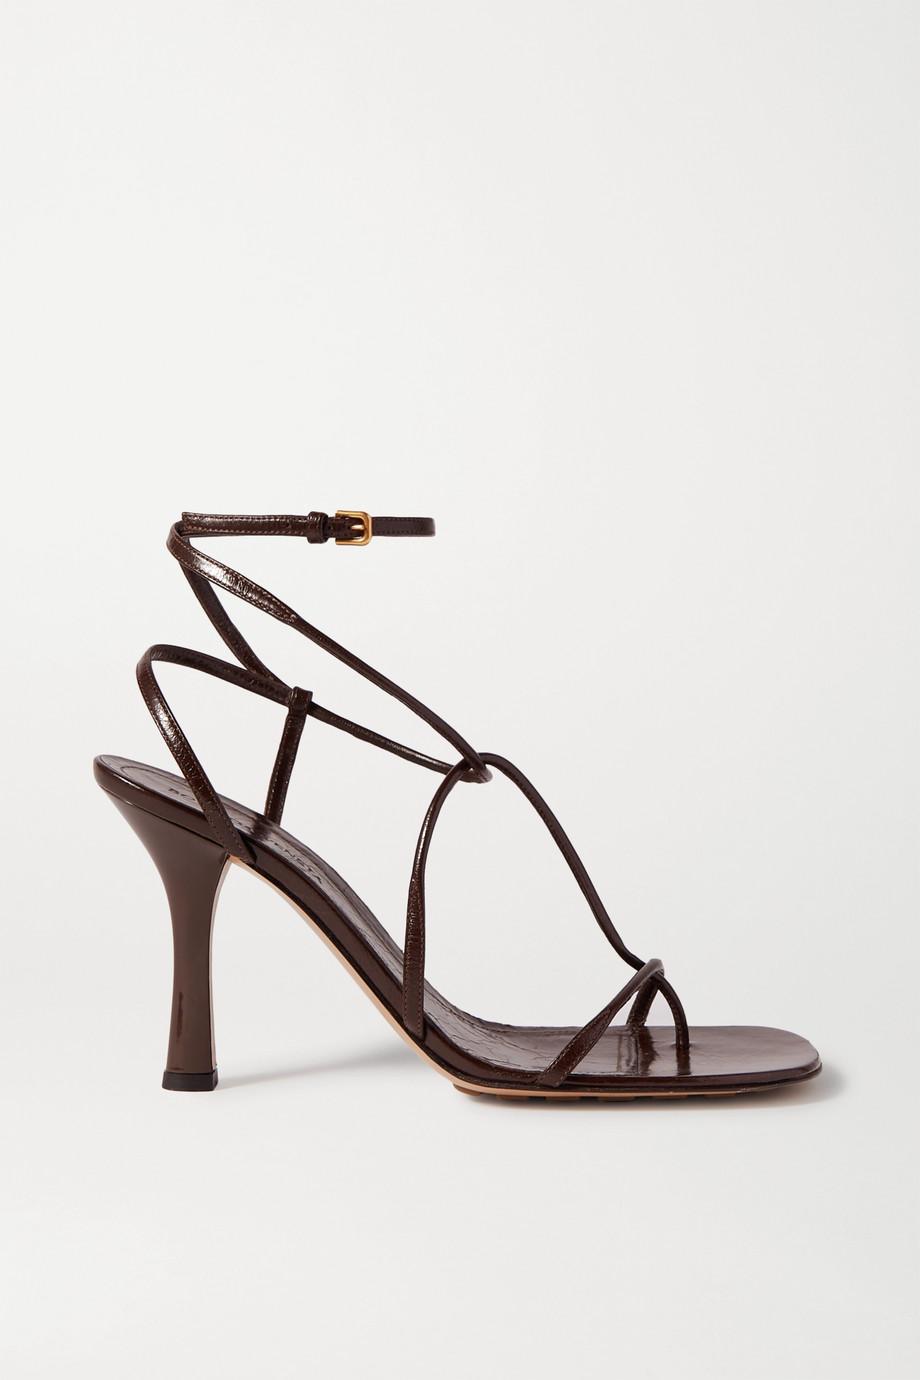 Bottega Veneta Sandalen aus Leder